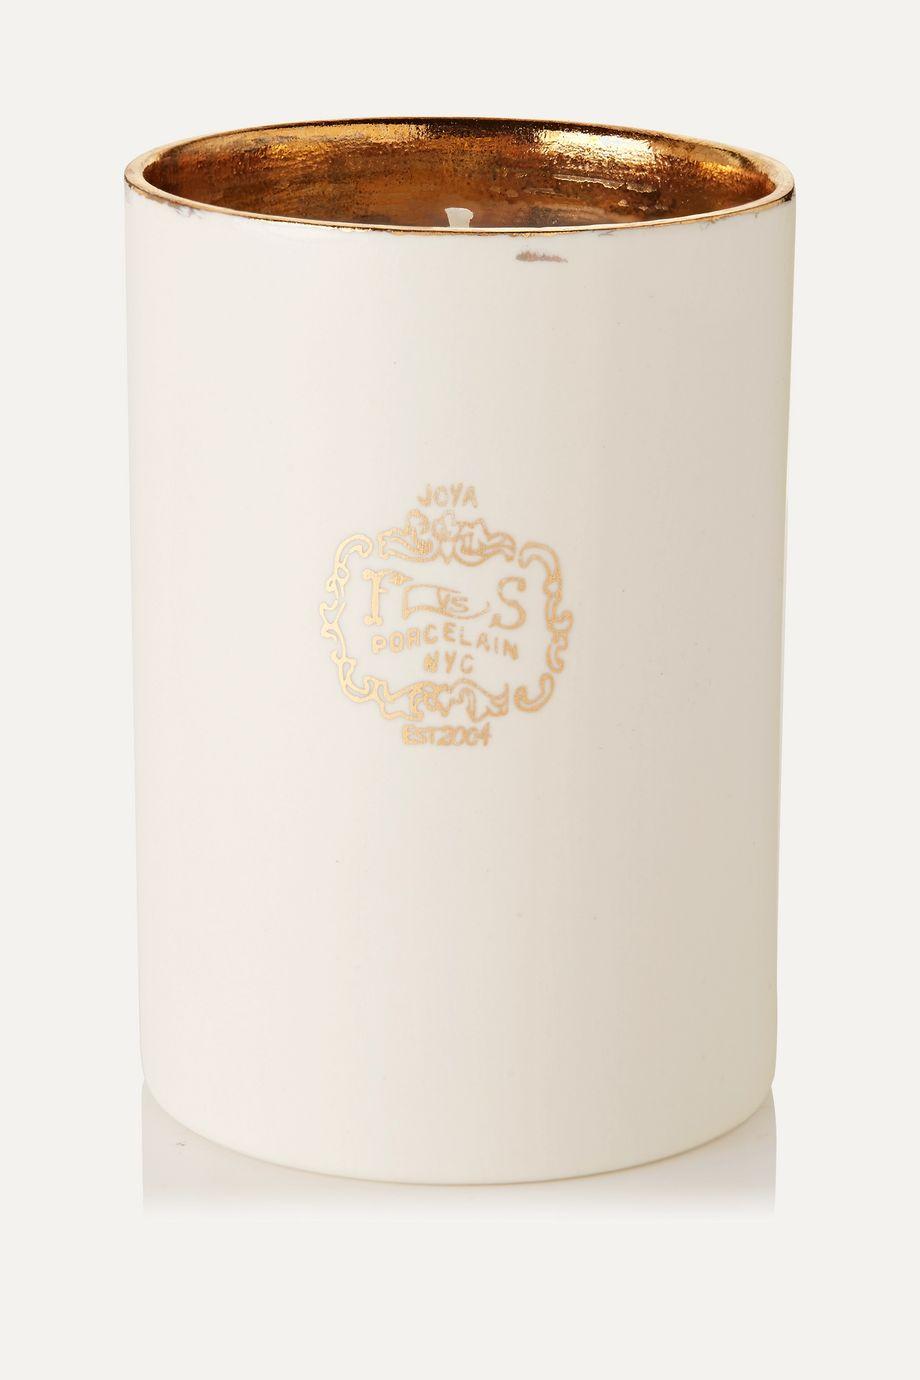 Joya Copaline scented candle, 260g